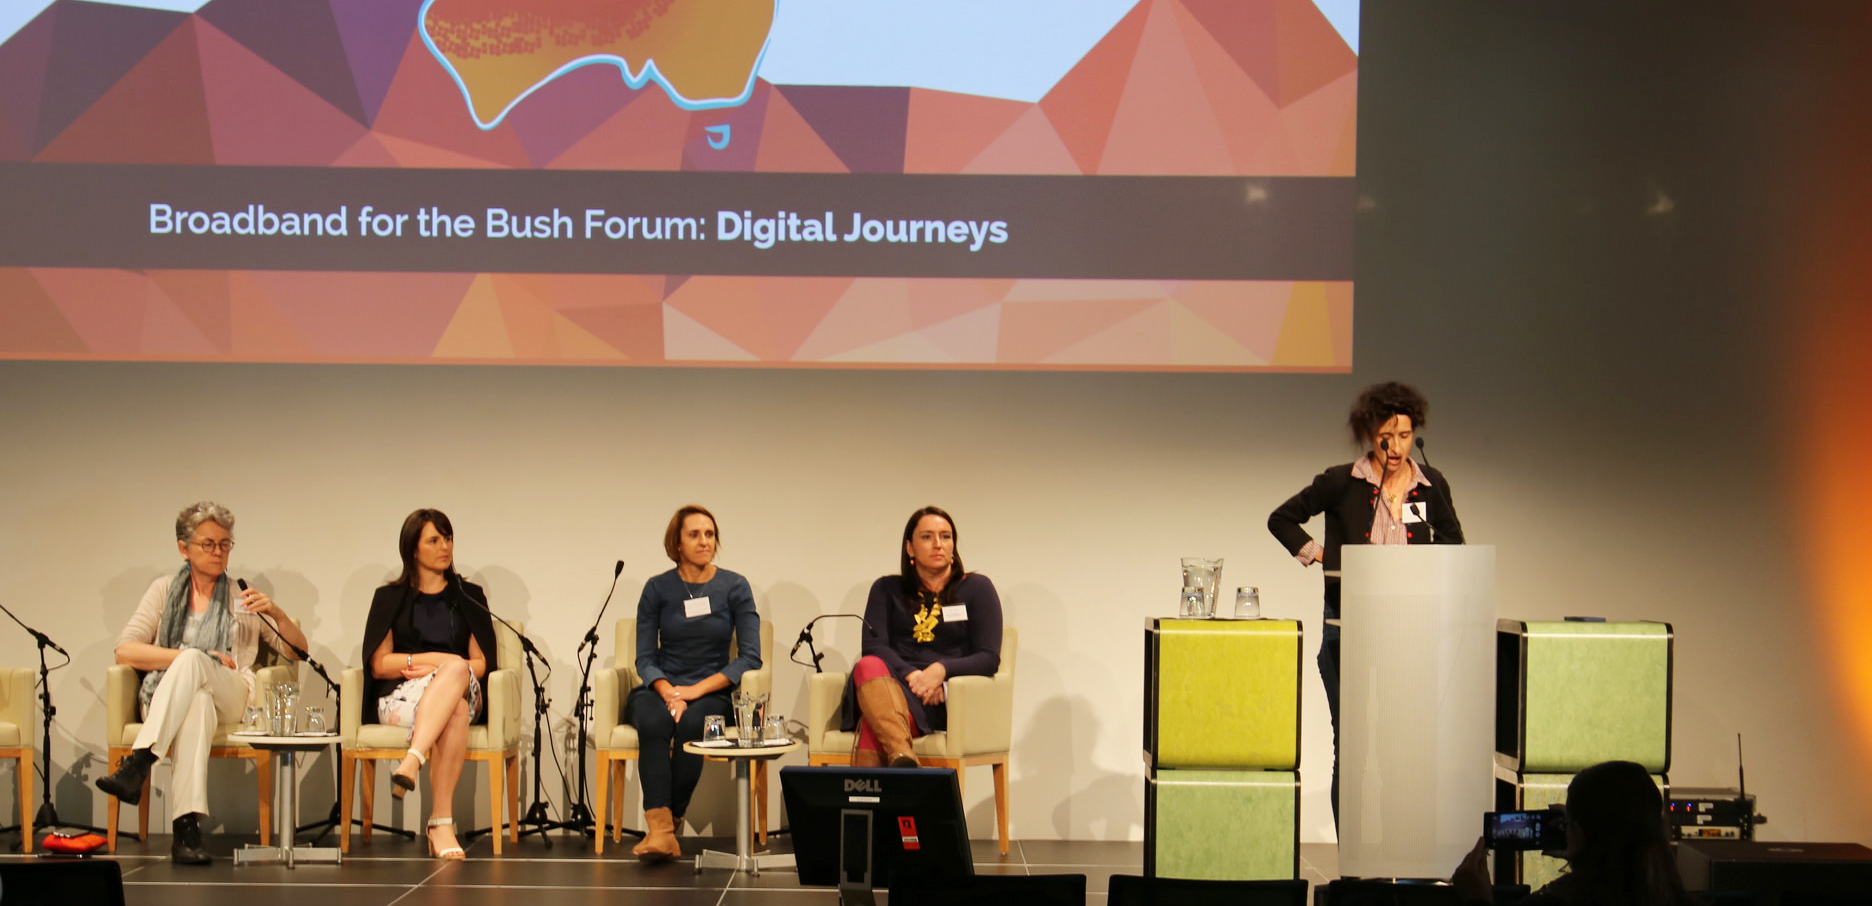 Broadband for the Bush Forum